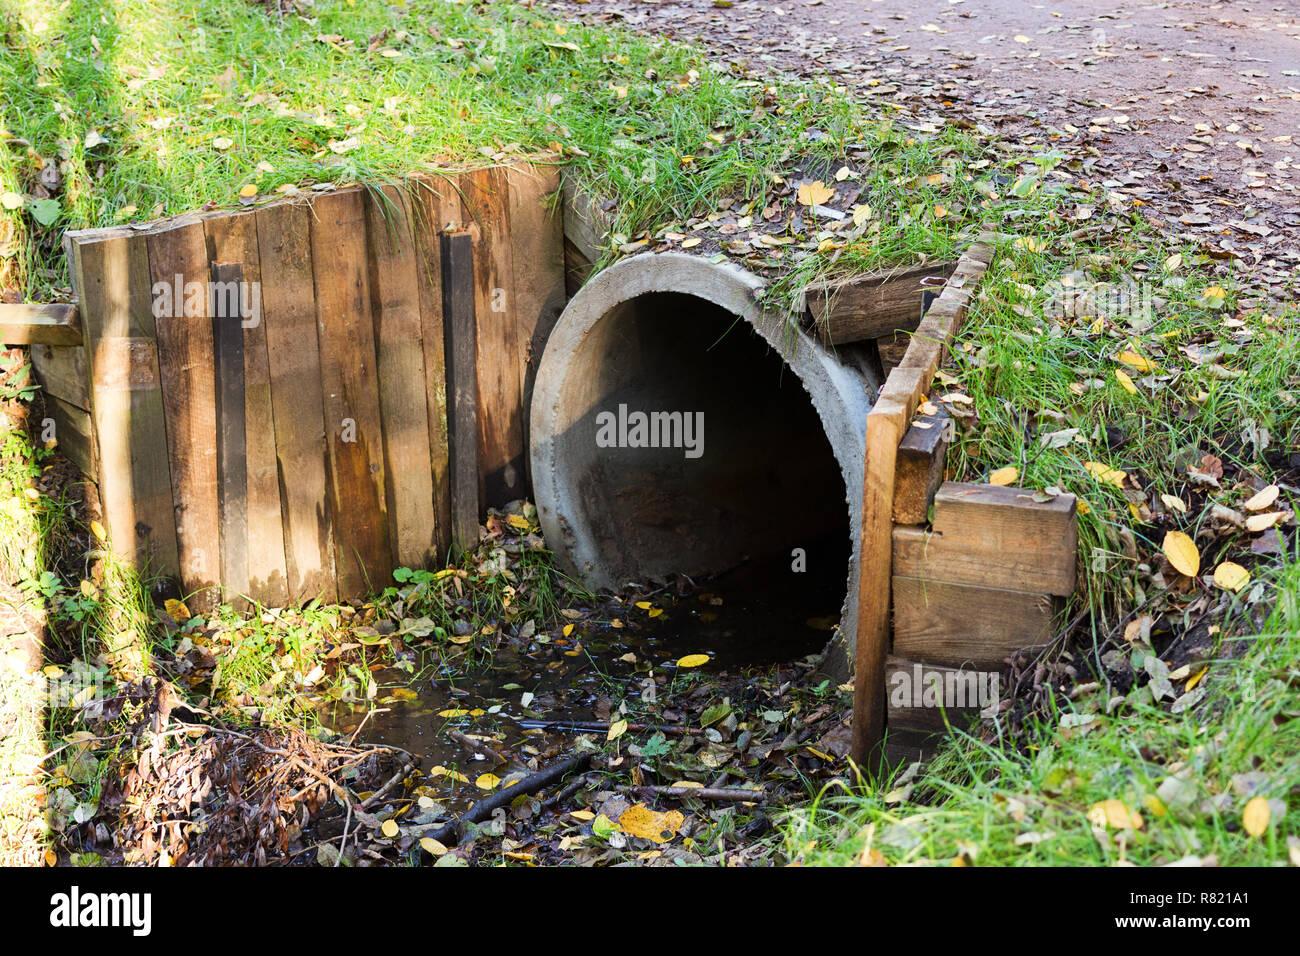 Culvert Pipe Stock Photos & Culvert Pipe Stock Images - Alamy